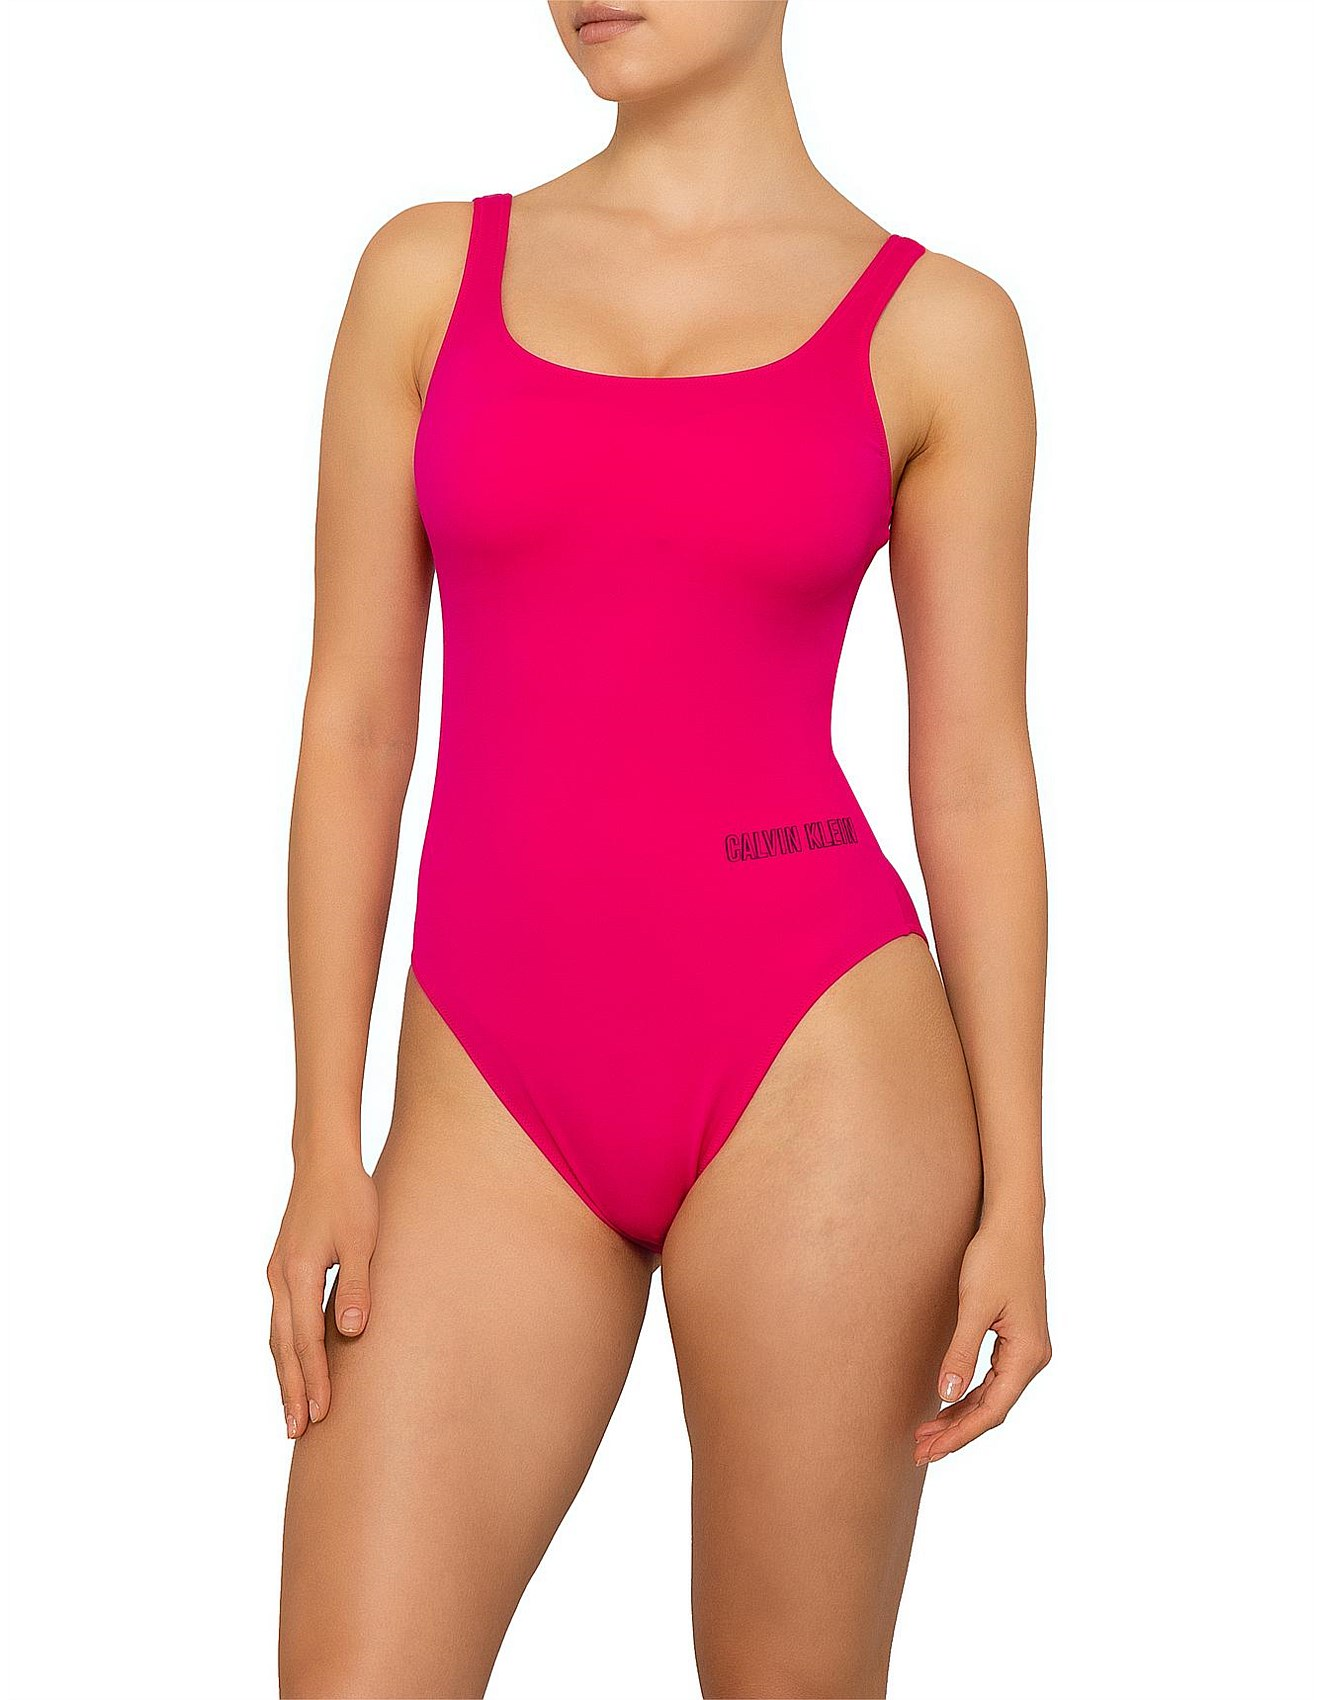 bbc8f9412fd3d Swimwear Sale | Buy Bikinis & Swimwear Online | David Jones - Intense Power  Square Scoop One Piece